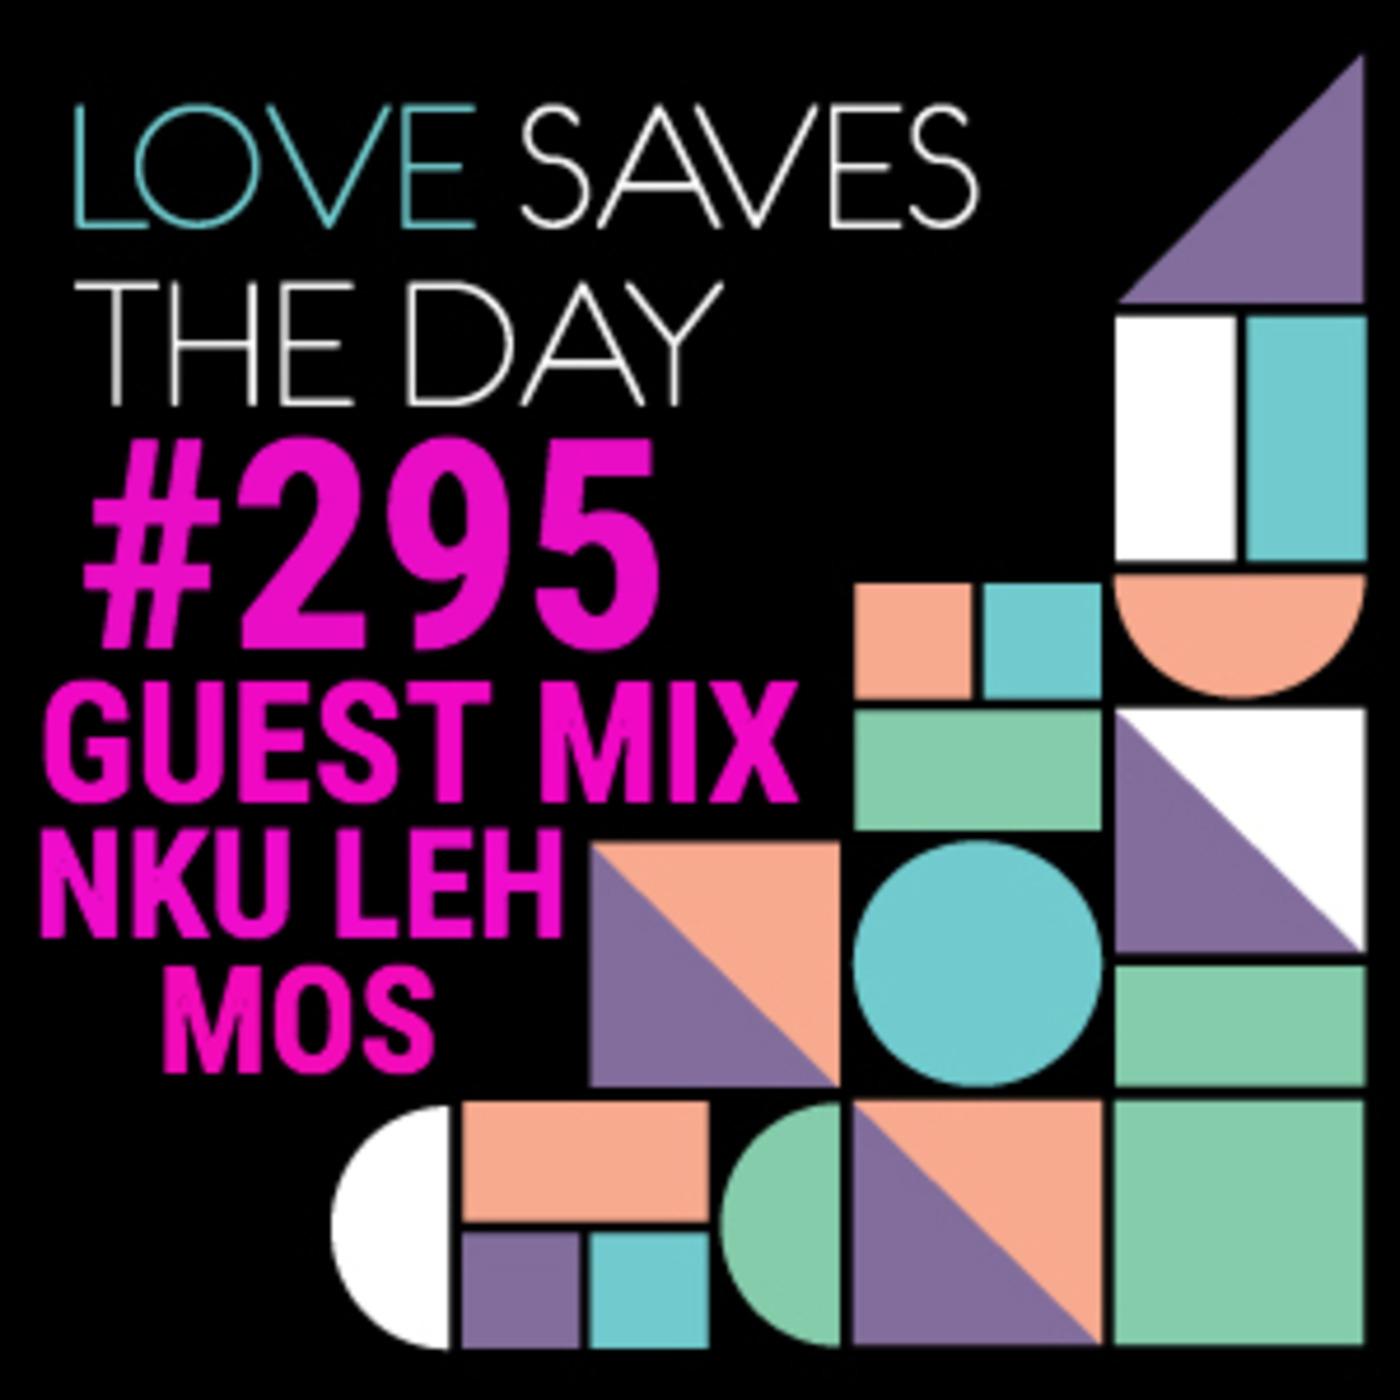 LOVESAVESTHEDAY#295 - GUESTMIX - NKU LEH MOS Wez Champion's podcast